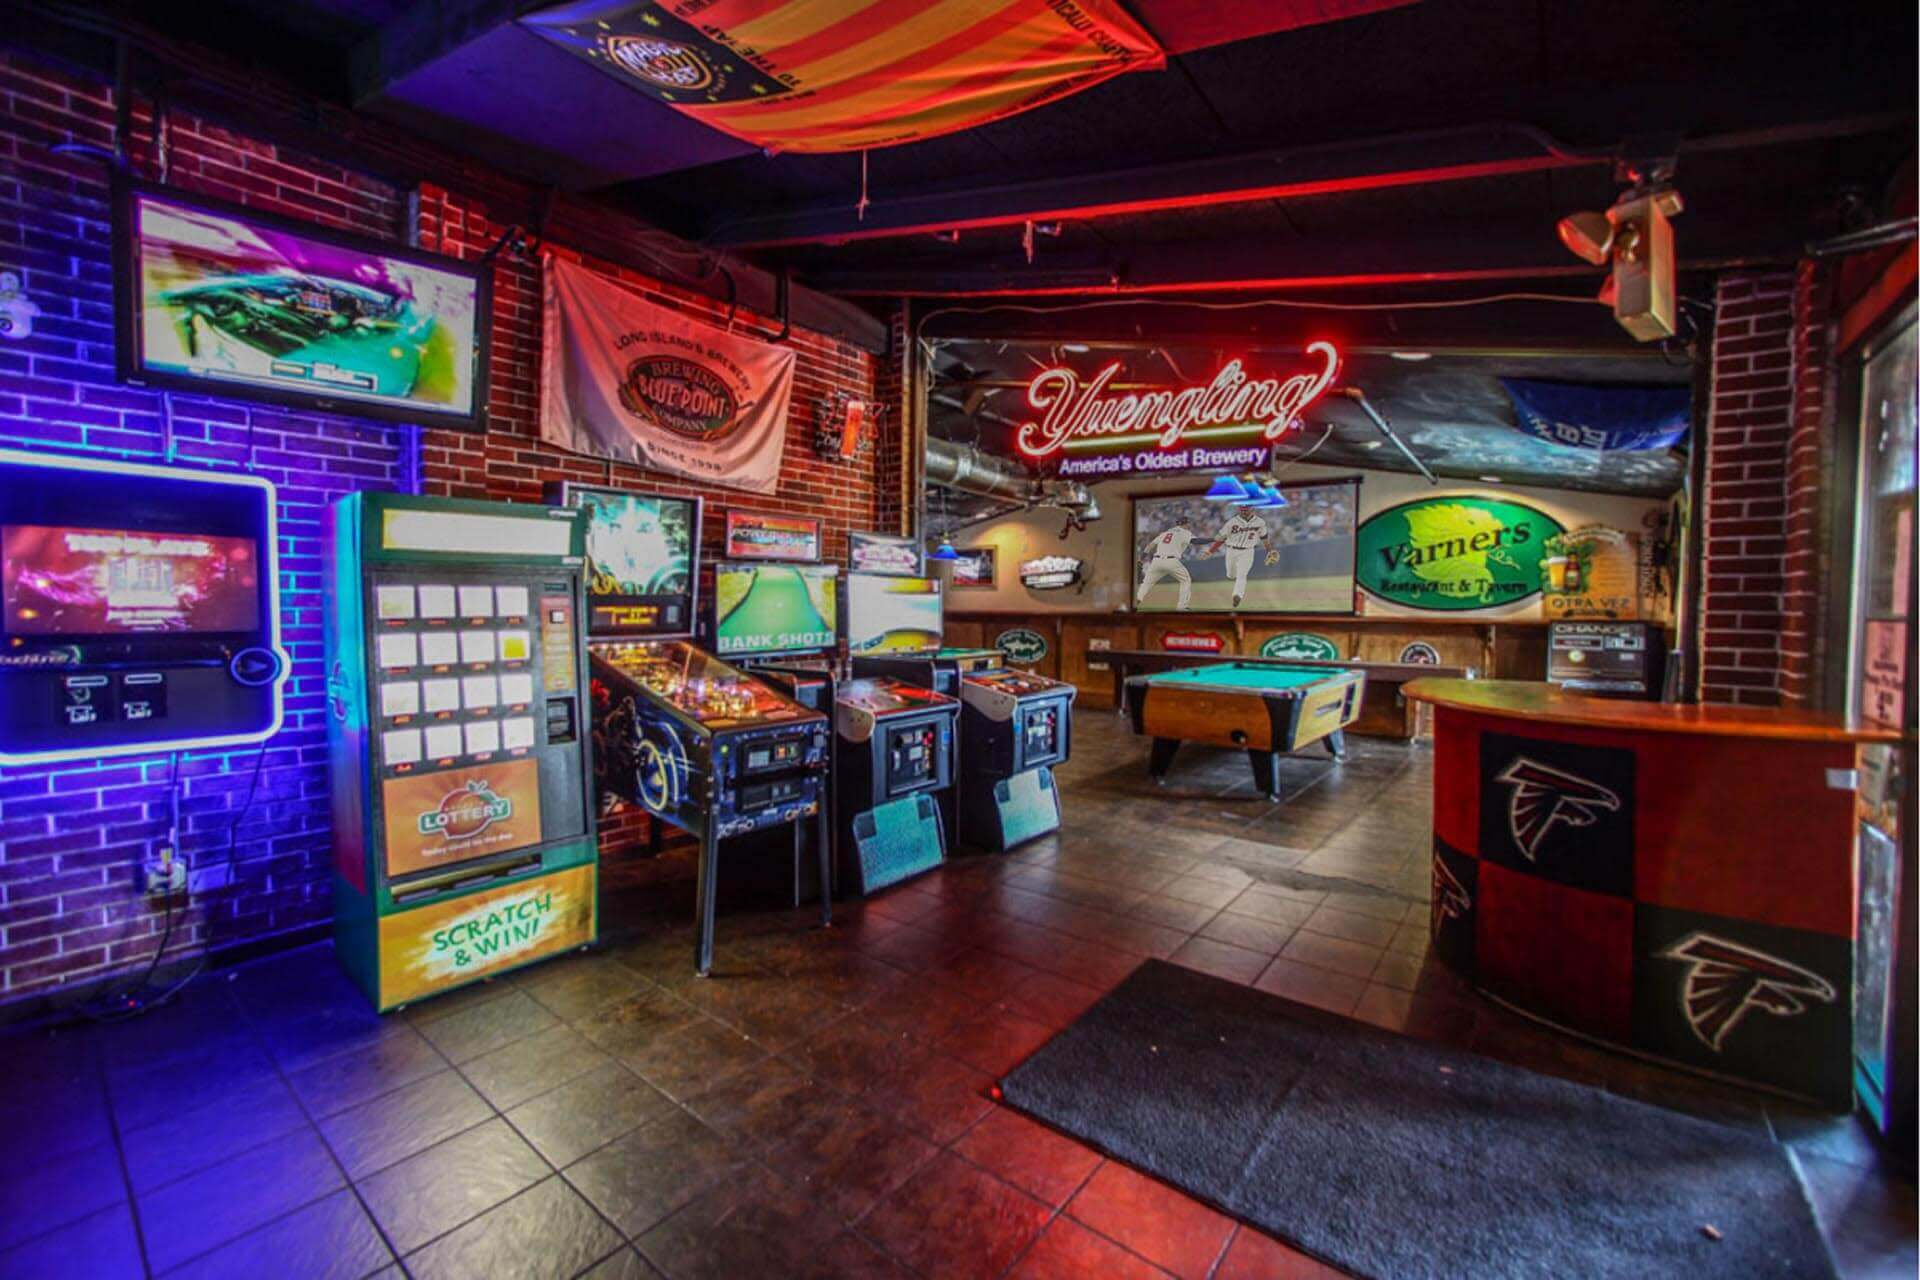 Game Room - Golden Tee - Pool - Pinball